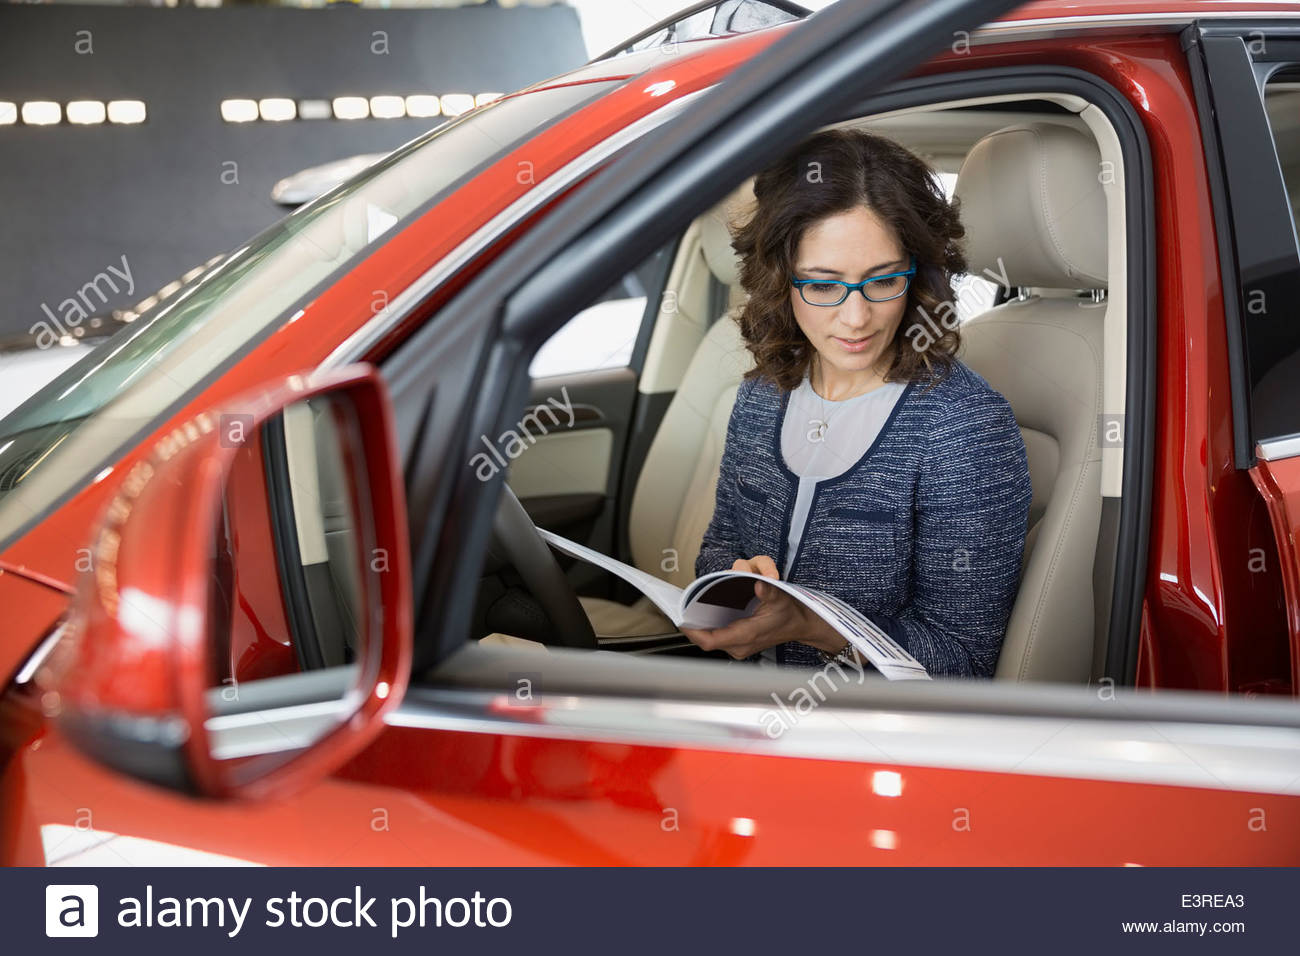 Frau betrachten Broschüre Fahrzeug beim Vertragshändler Stockbild